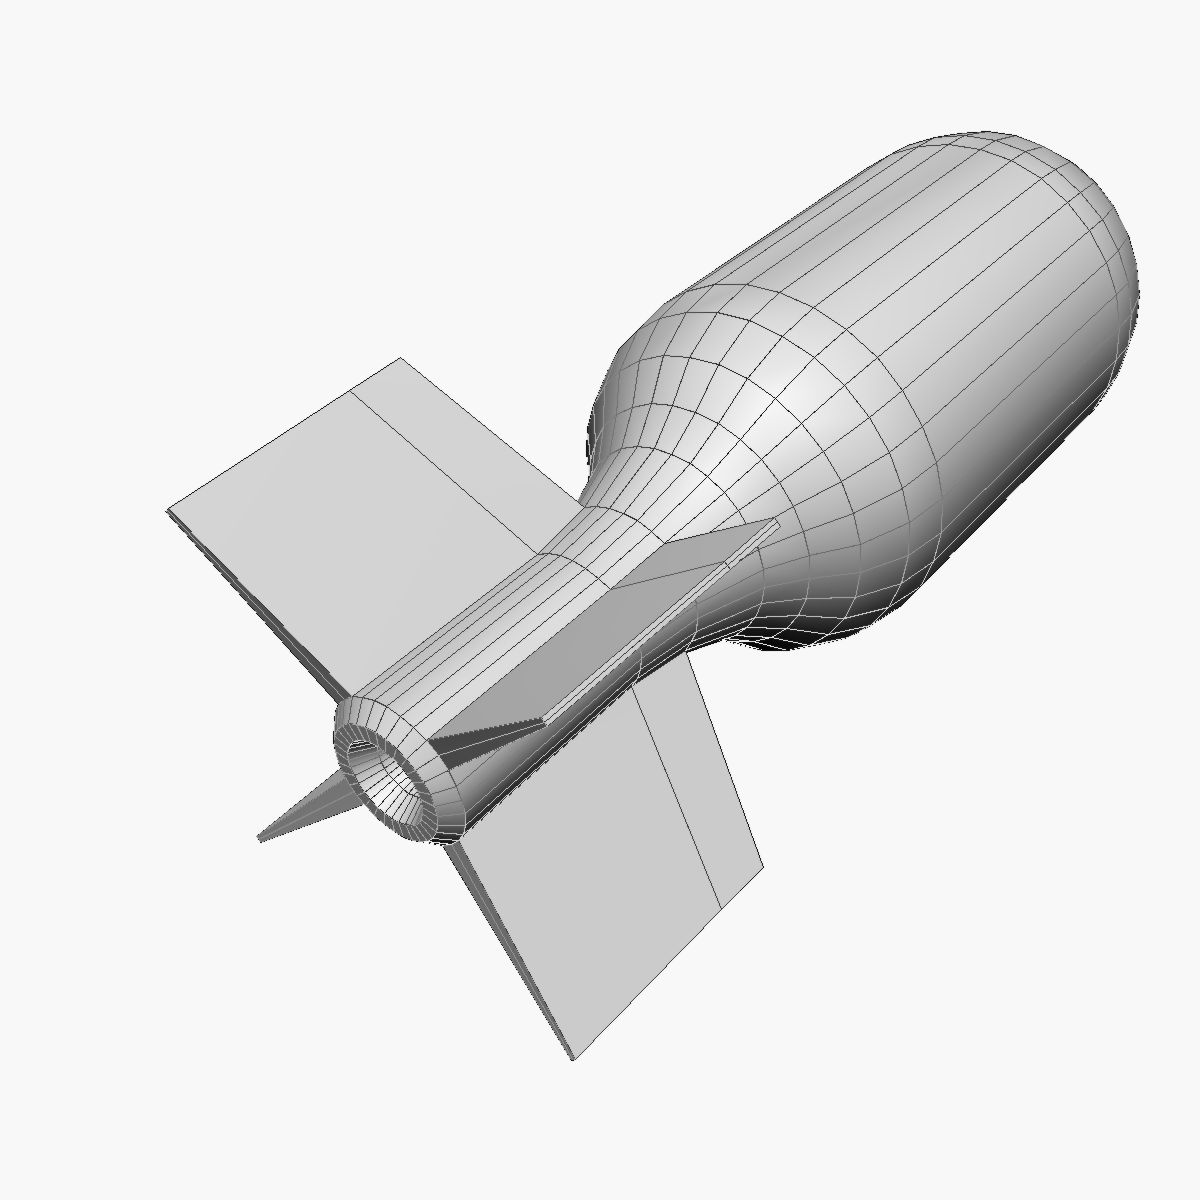 Bomb, Jolly Roger scheme 3d model 3ds dxf fbx blend cob dae X obj 162675